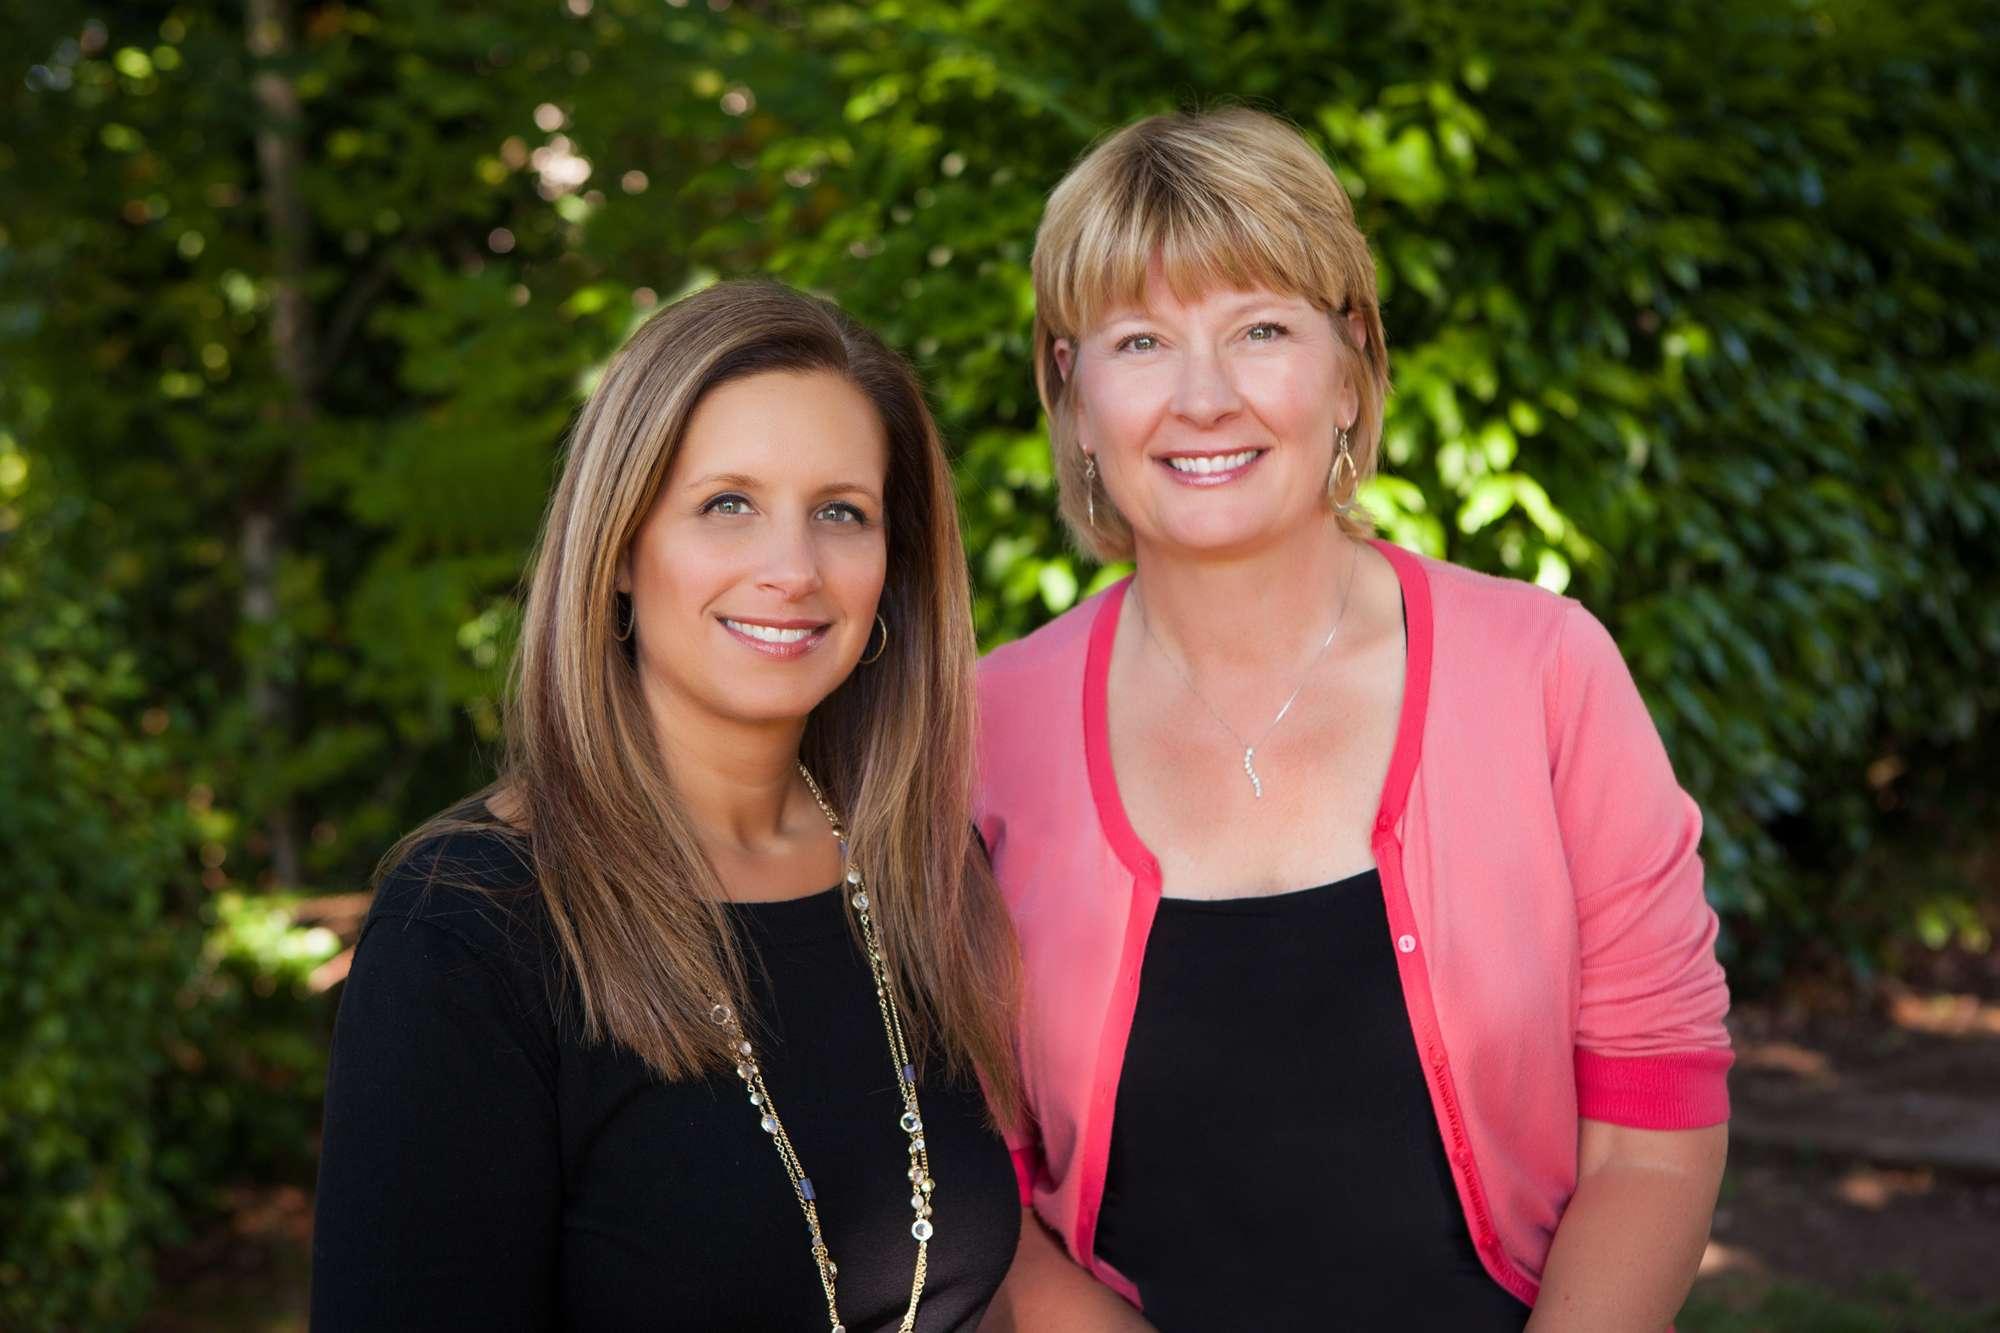 Jill&Kathy_small